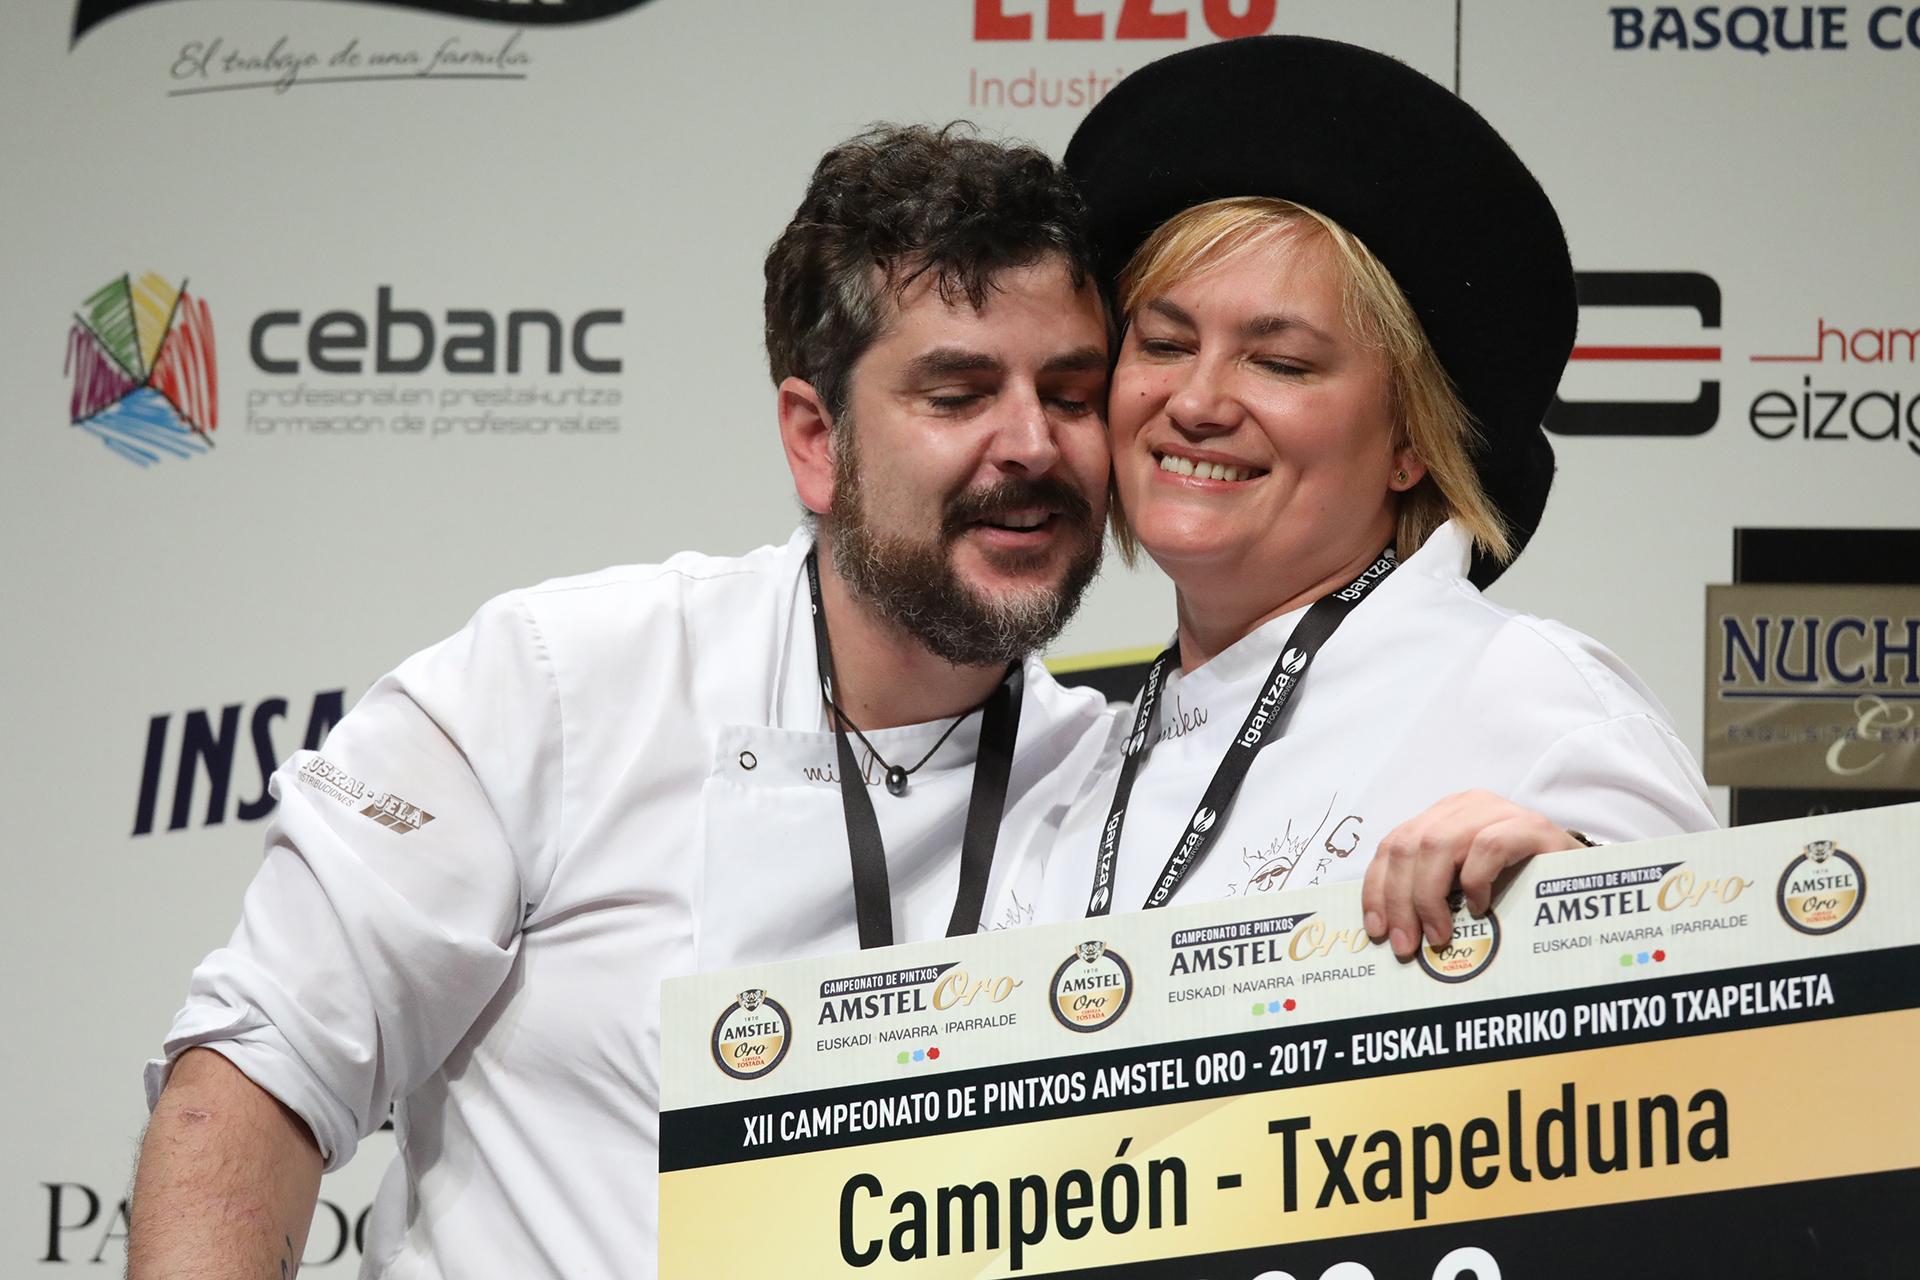 Gran-Sol-Pintxos-2017-Campeon